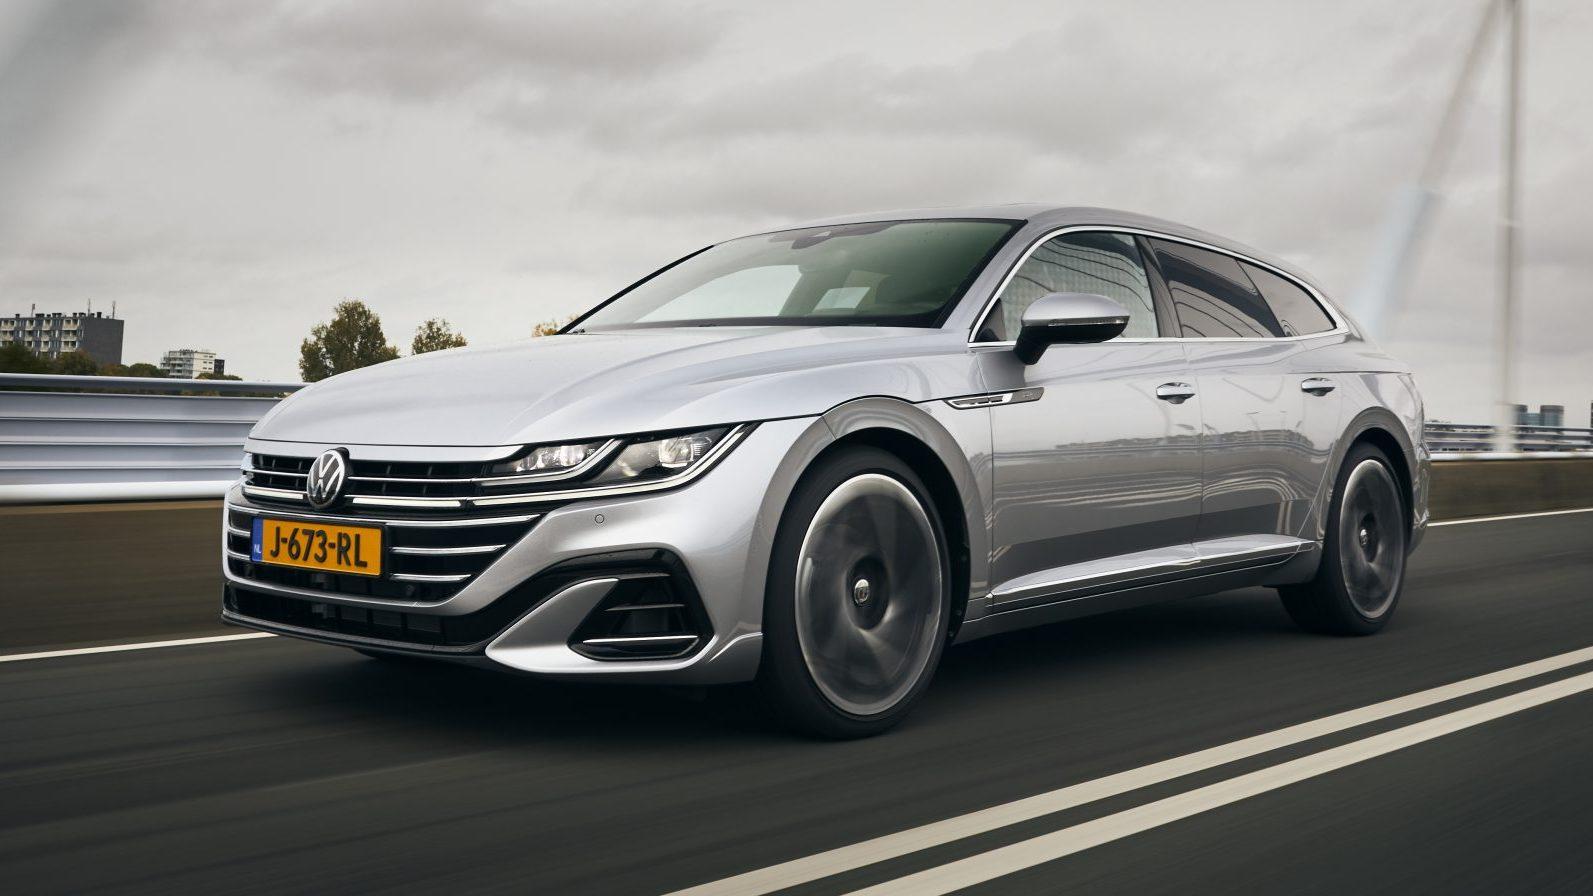 Volkswagen Arteon Shooting Brake 2.0 TSI op de snelweg in Nederland